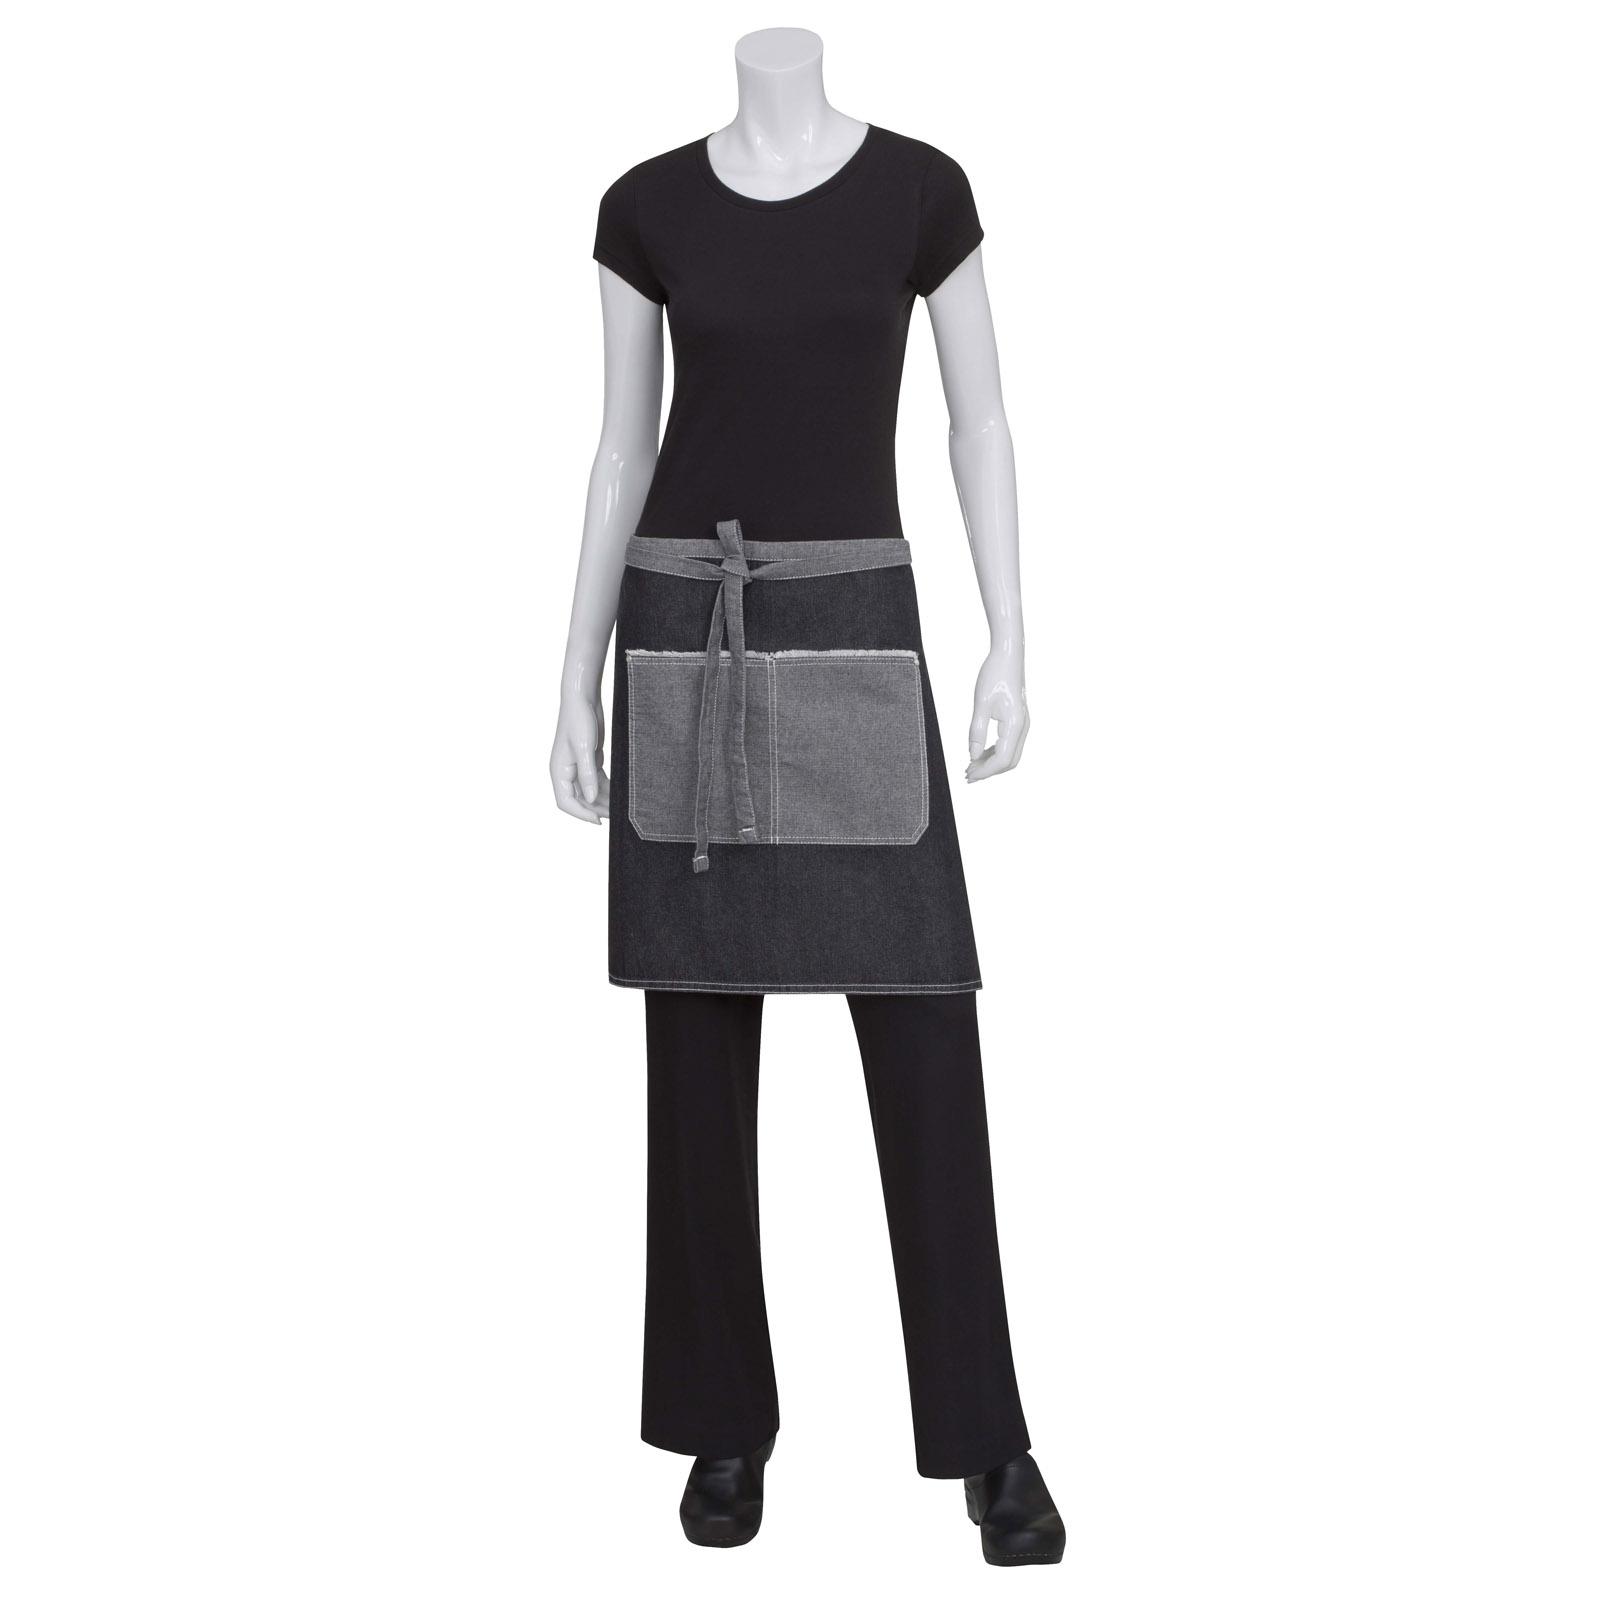 Chef Works AW044BLK0 waist apron